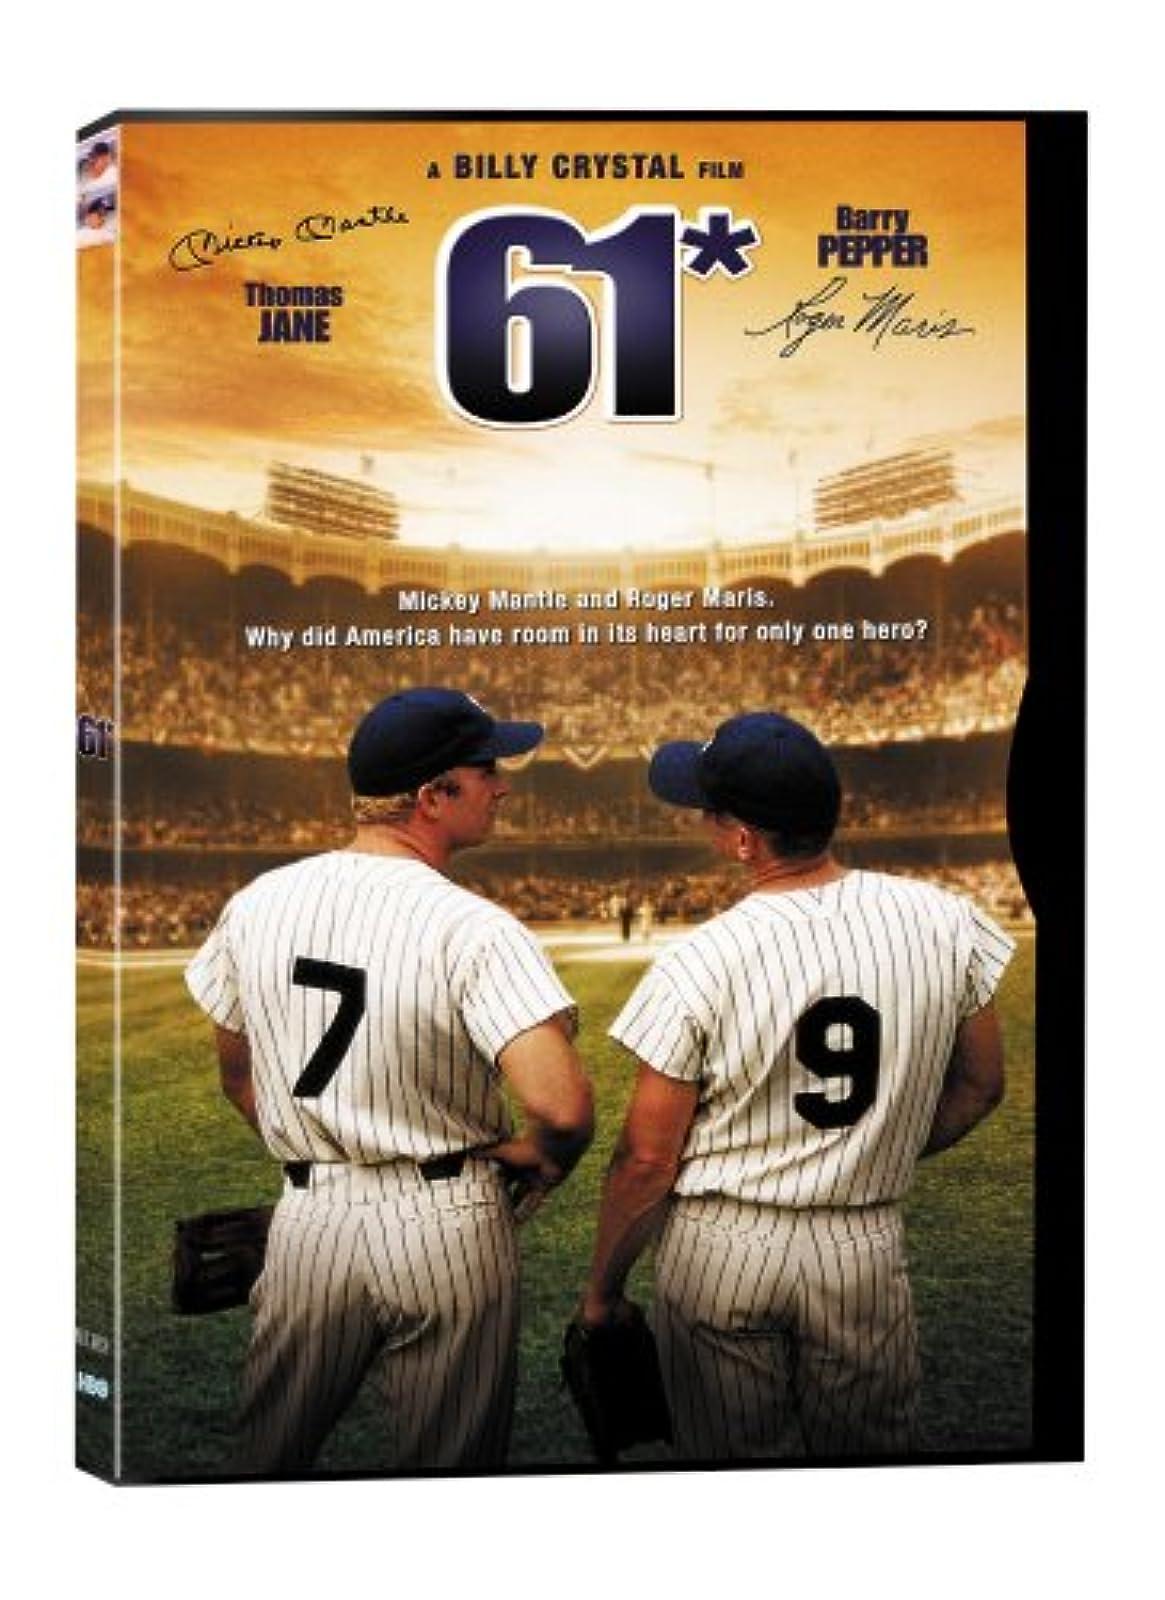 61* DVD On DVD With Thomas Jane